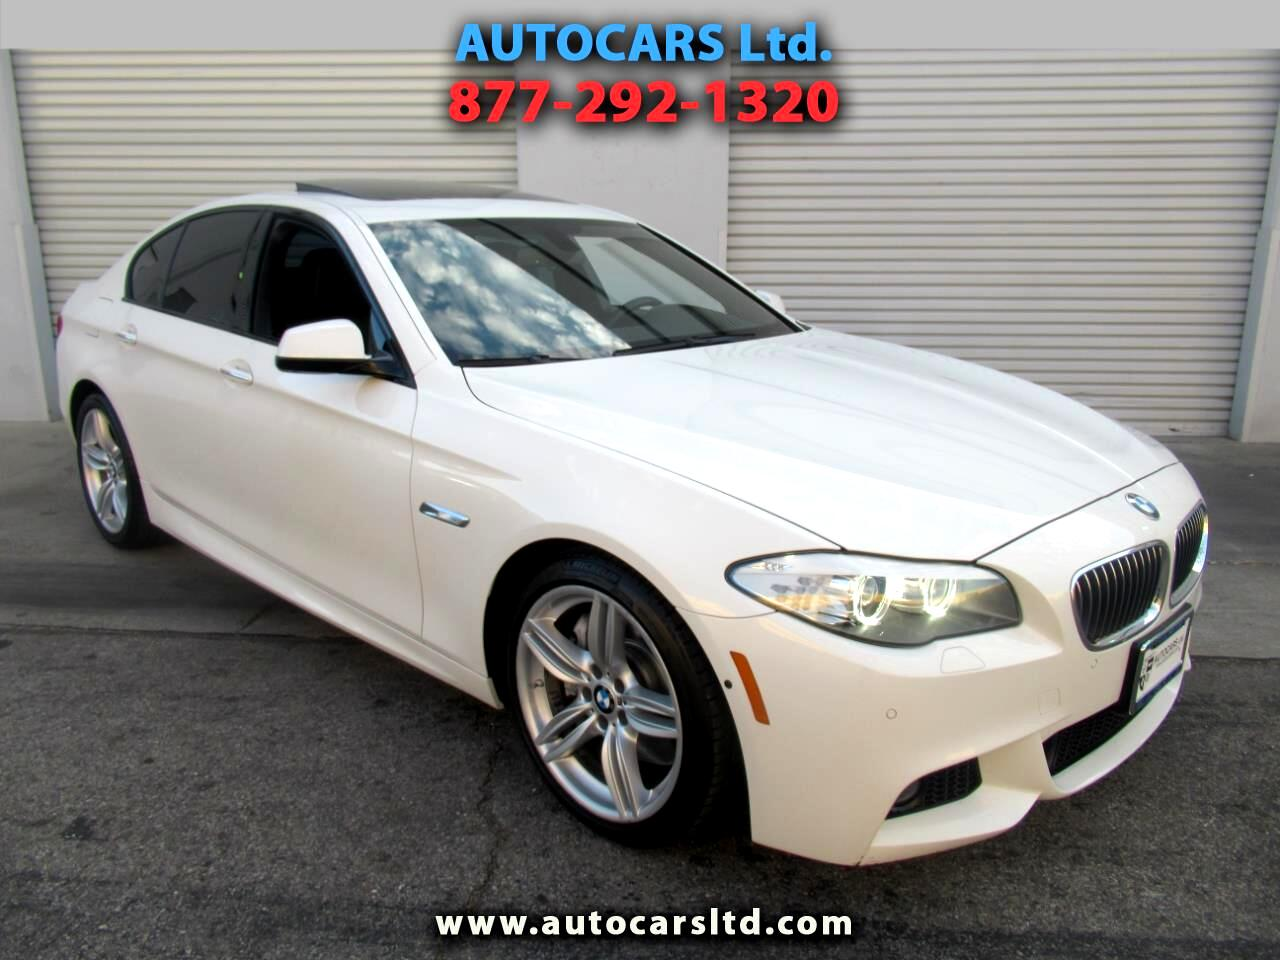 BMW 5 Series 535i Automatic 2013